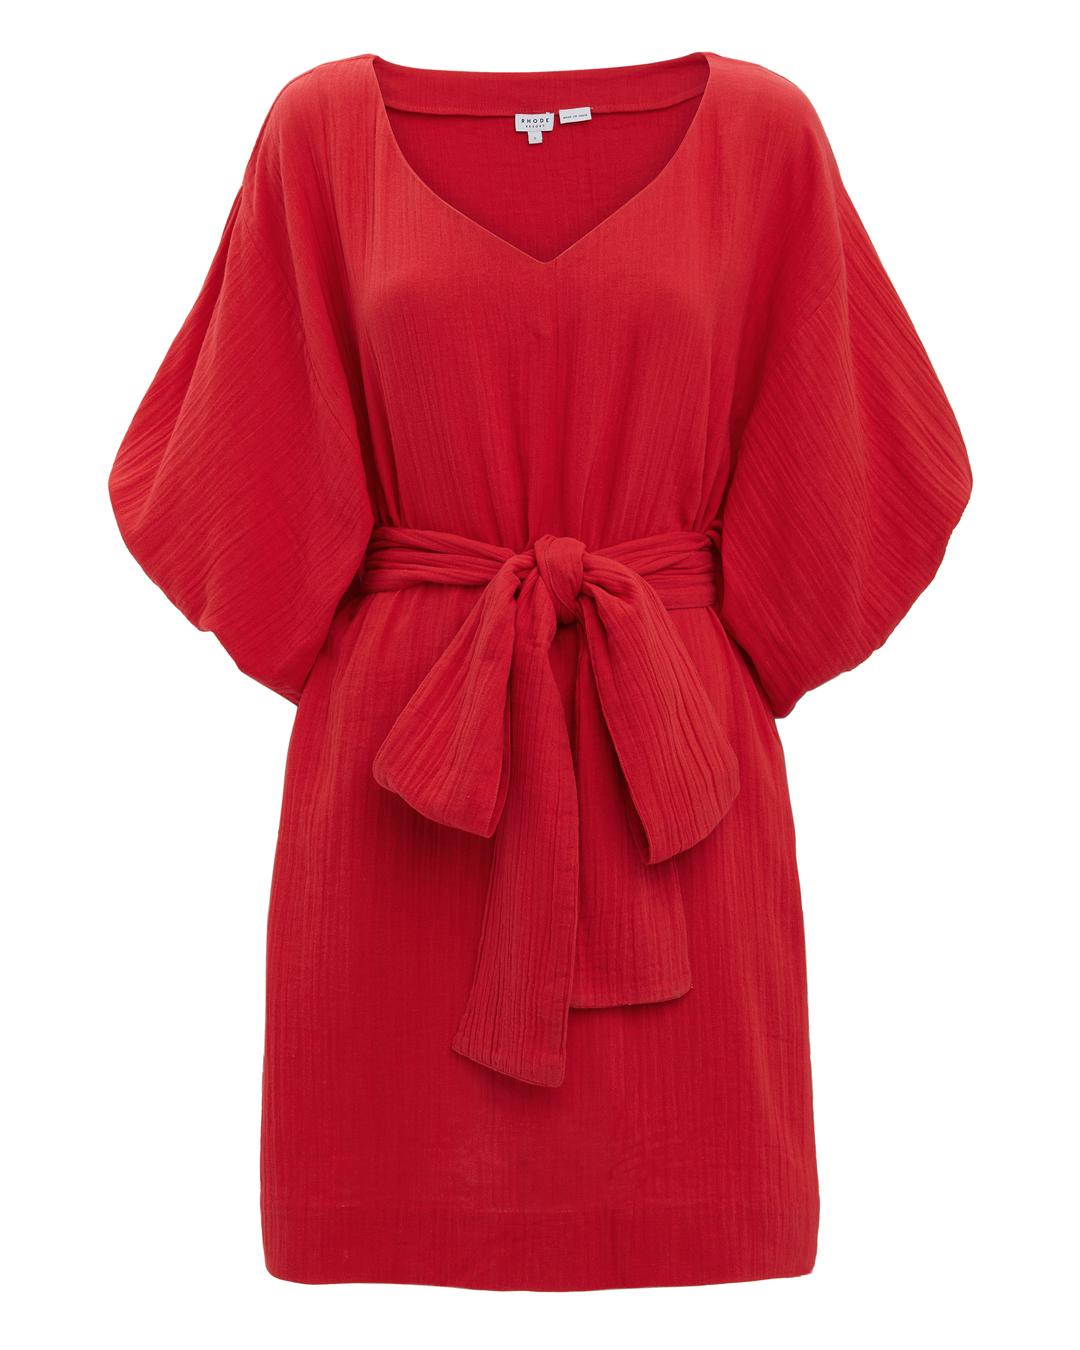 RHODE RESORT Arya Mini Dress